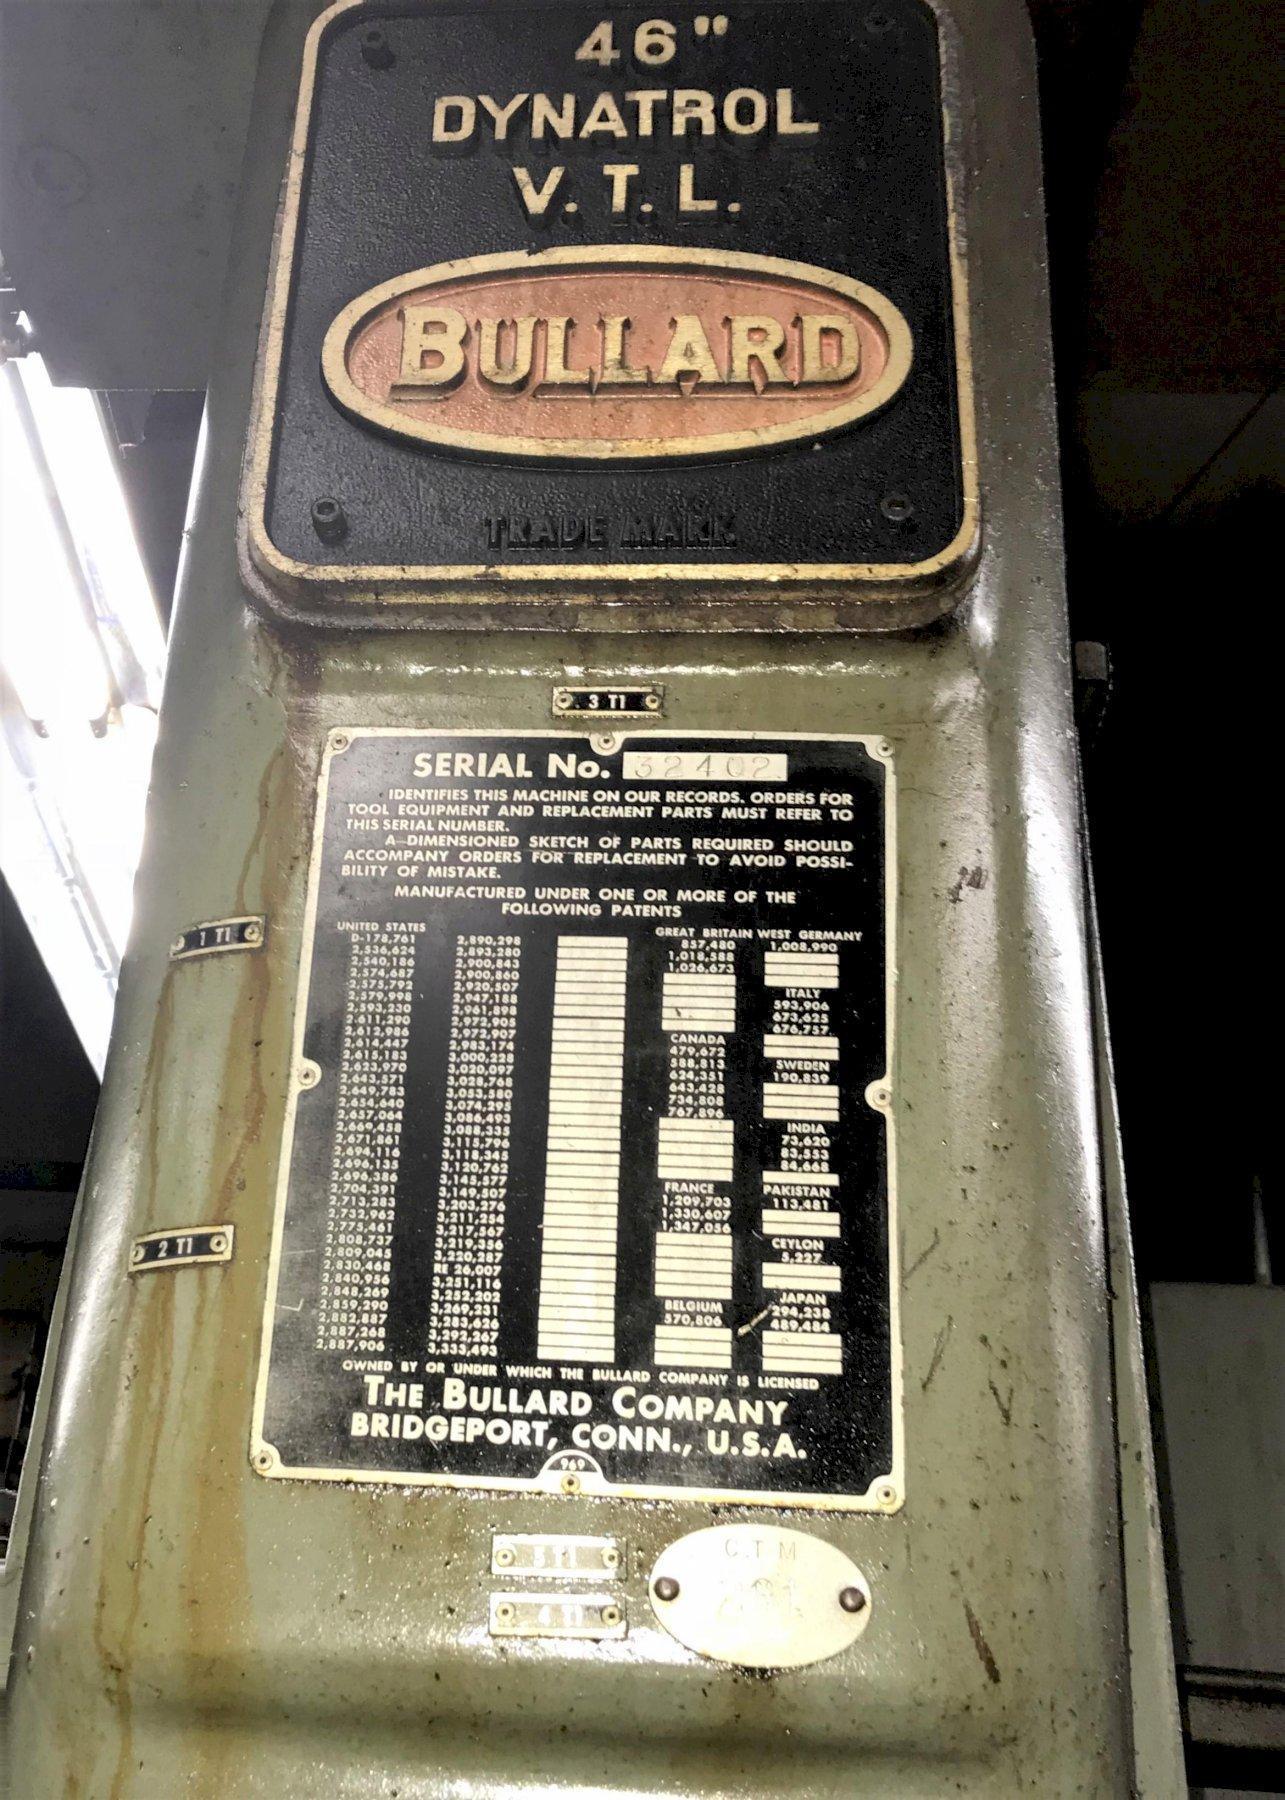 "Bullard Dynatrol 46"" Vertical Turret Lathe"